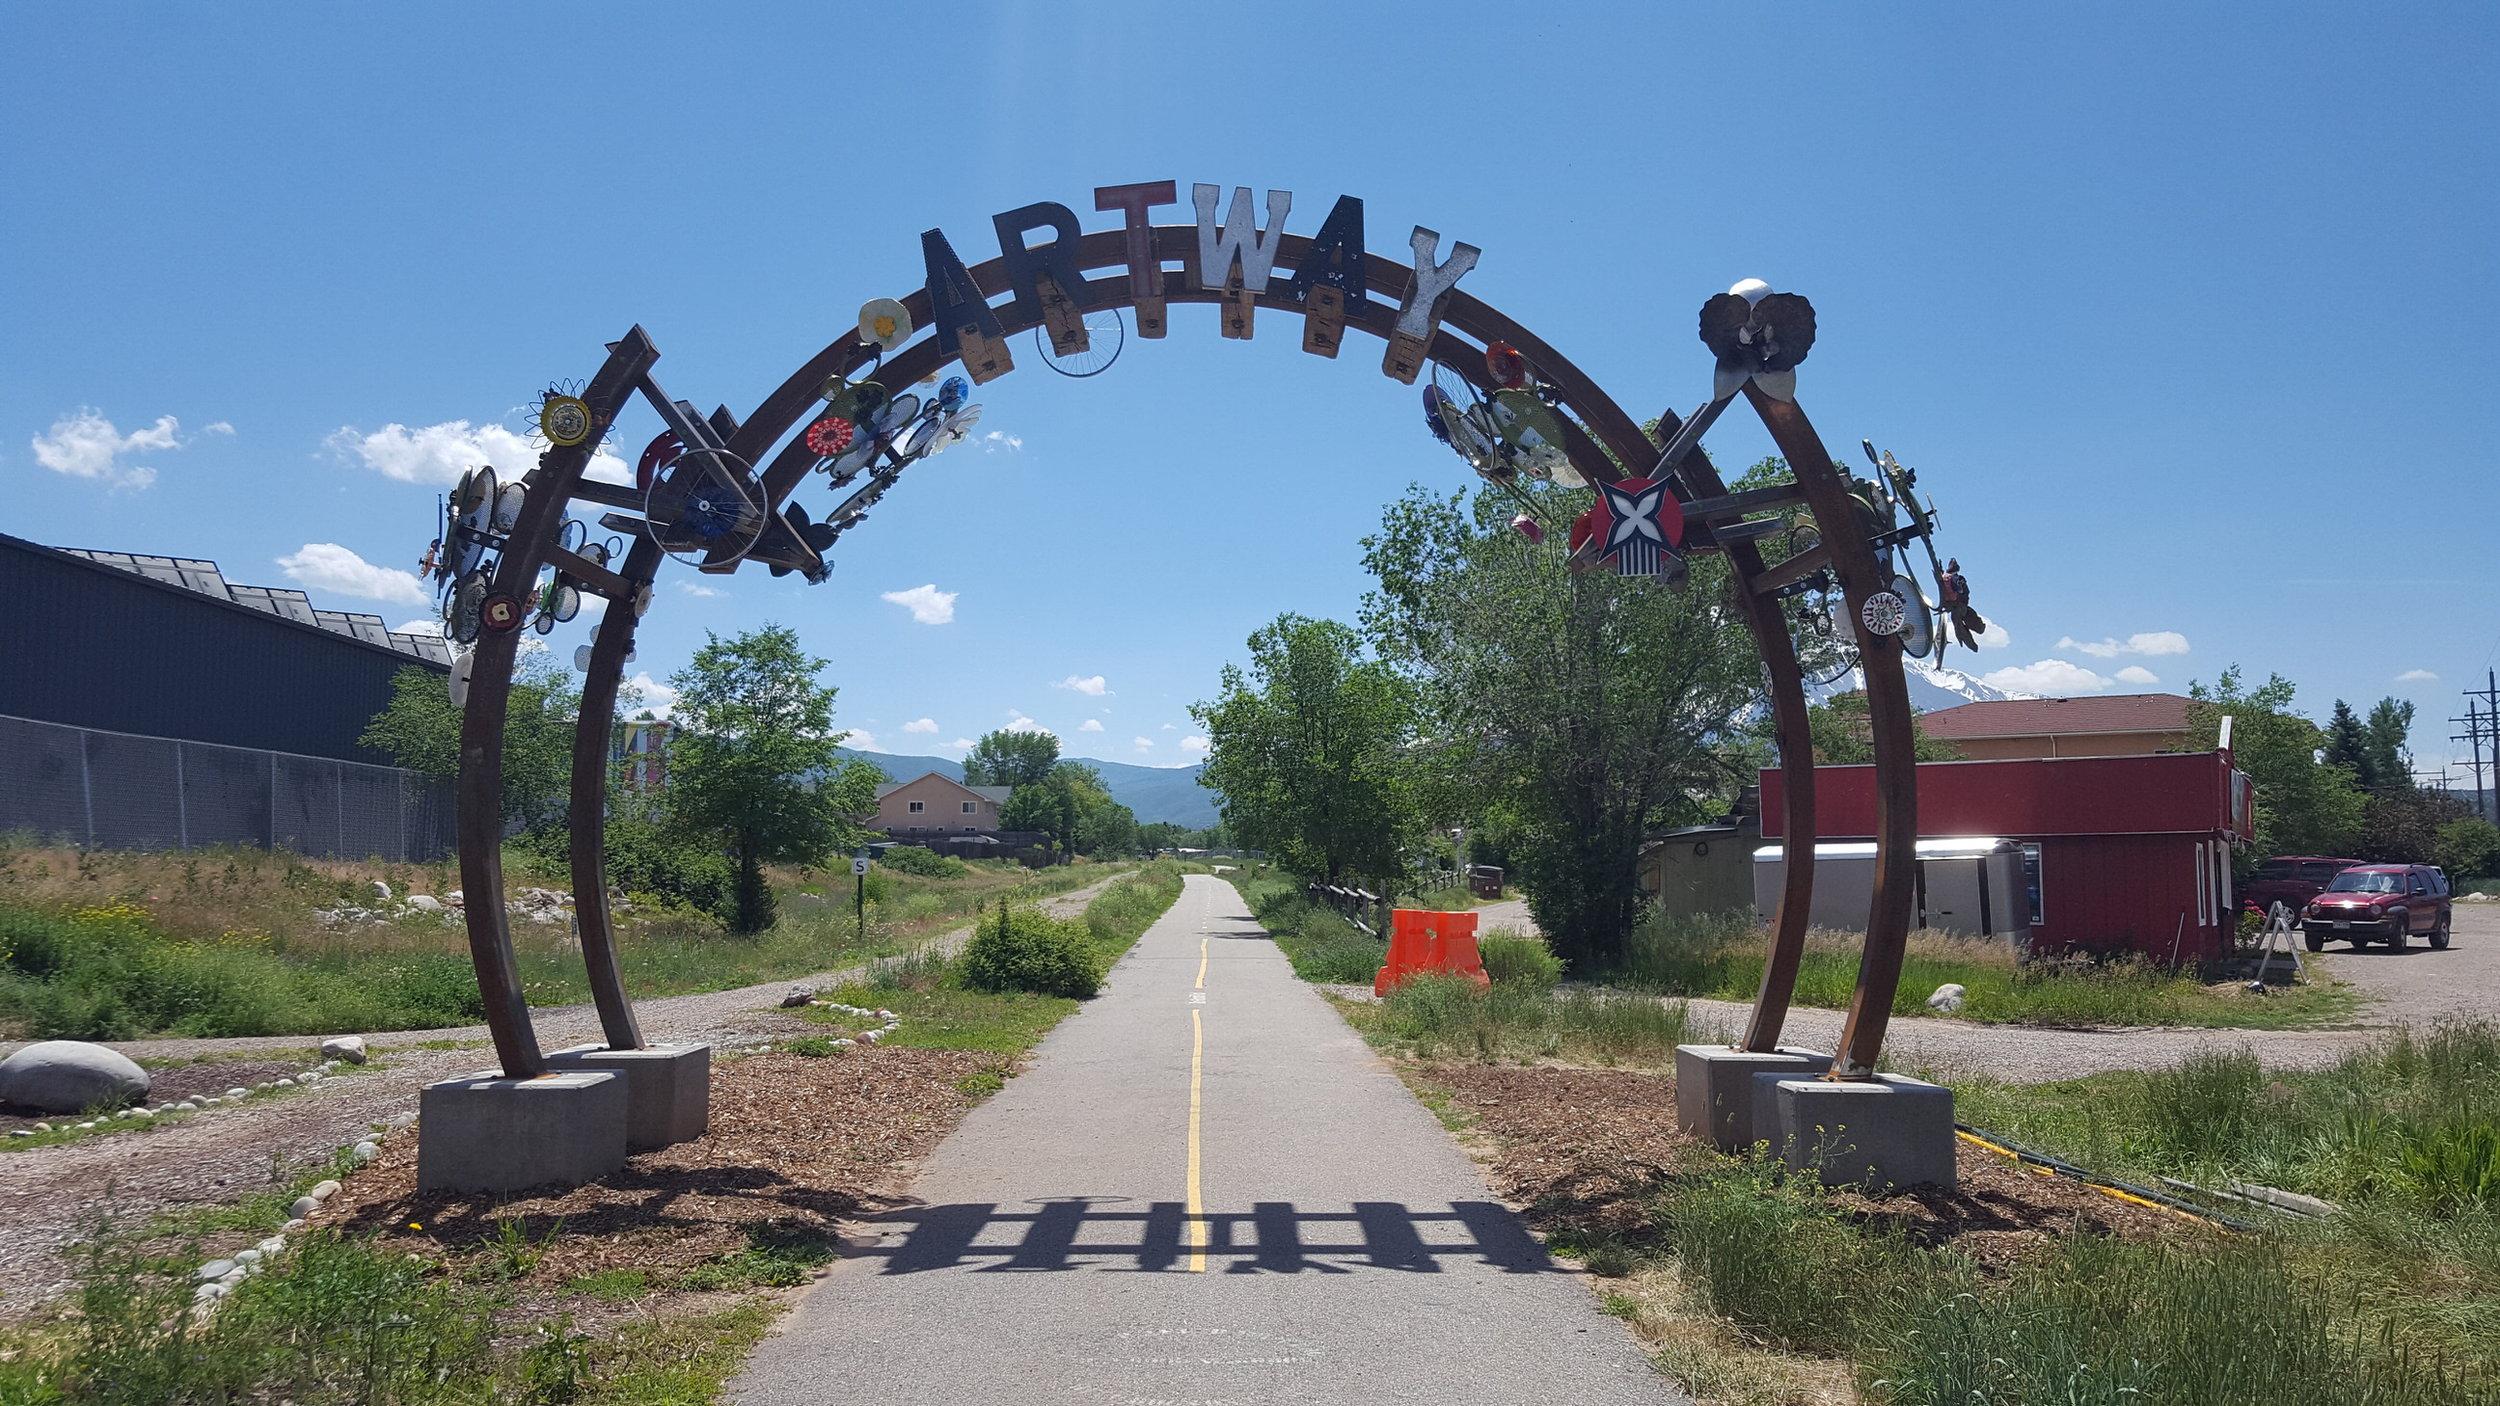 - ARTchway at DeRail Park